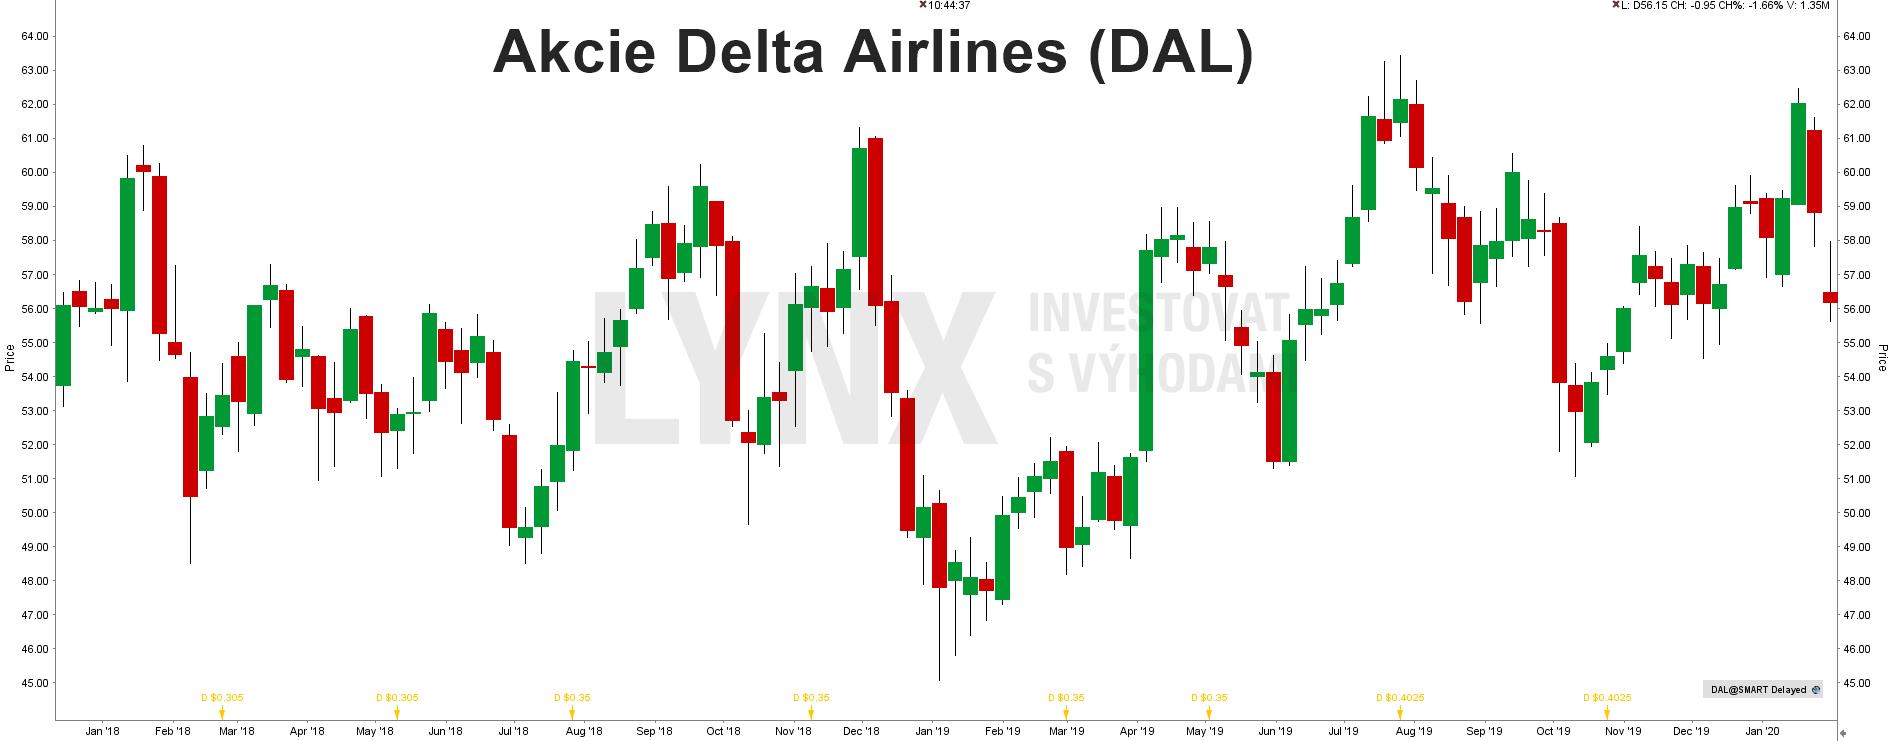 Akcie Delta Airlines